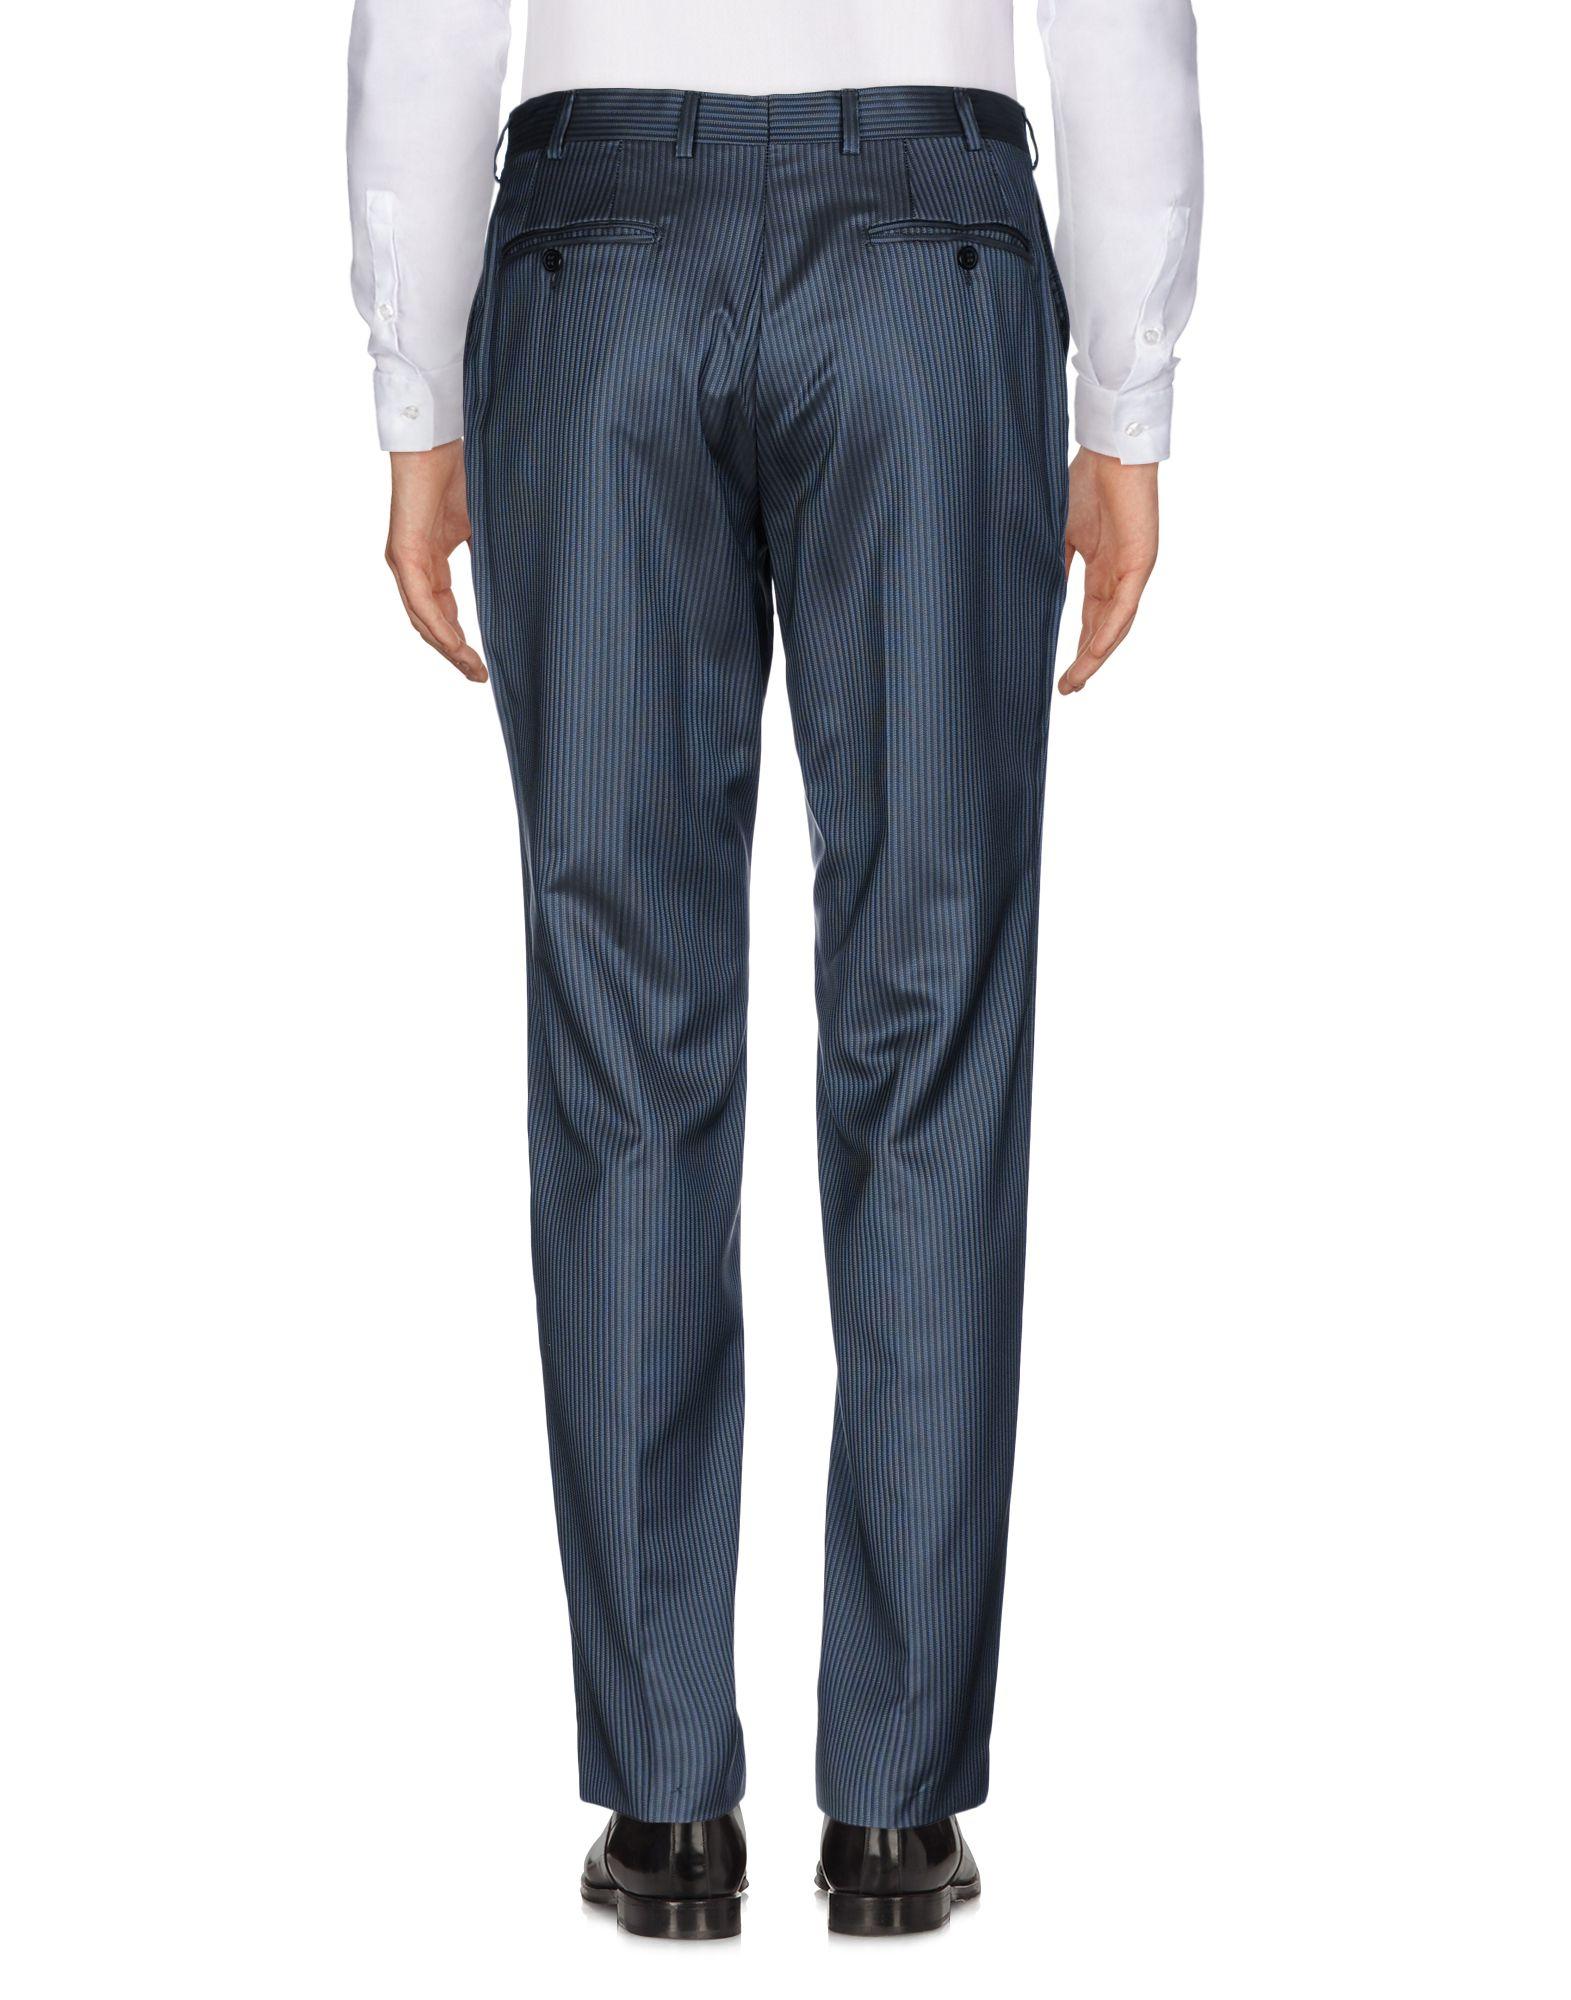 Pantalone Luigi Bianchi Mantova Uomo Uomo Mantova - 13101552LS d20f24